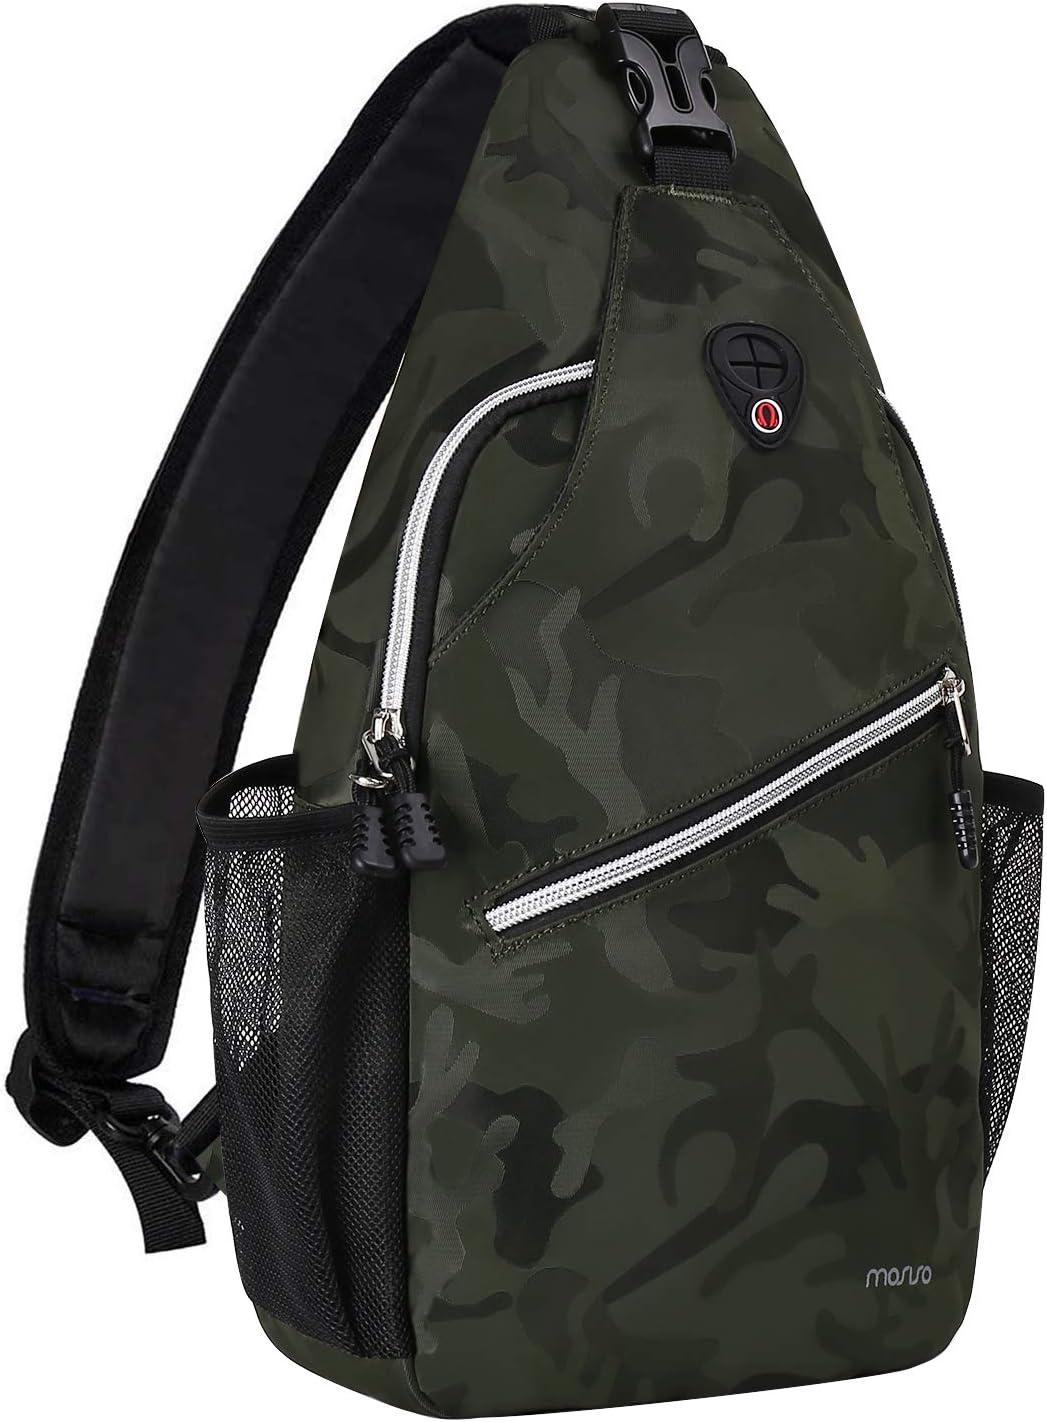 MOSISO Sling Backpack Travel Hiking free Daypack Pattern price Crossbo Rope